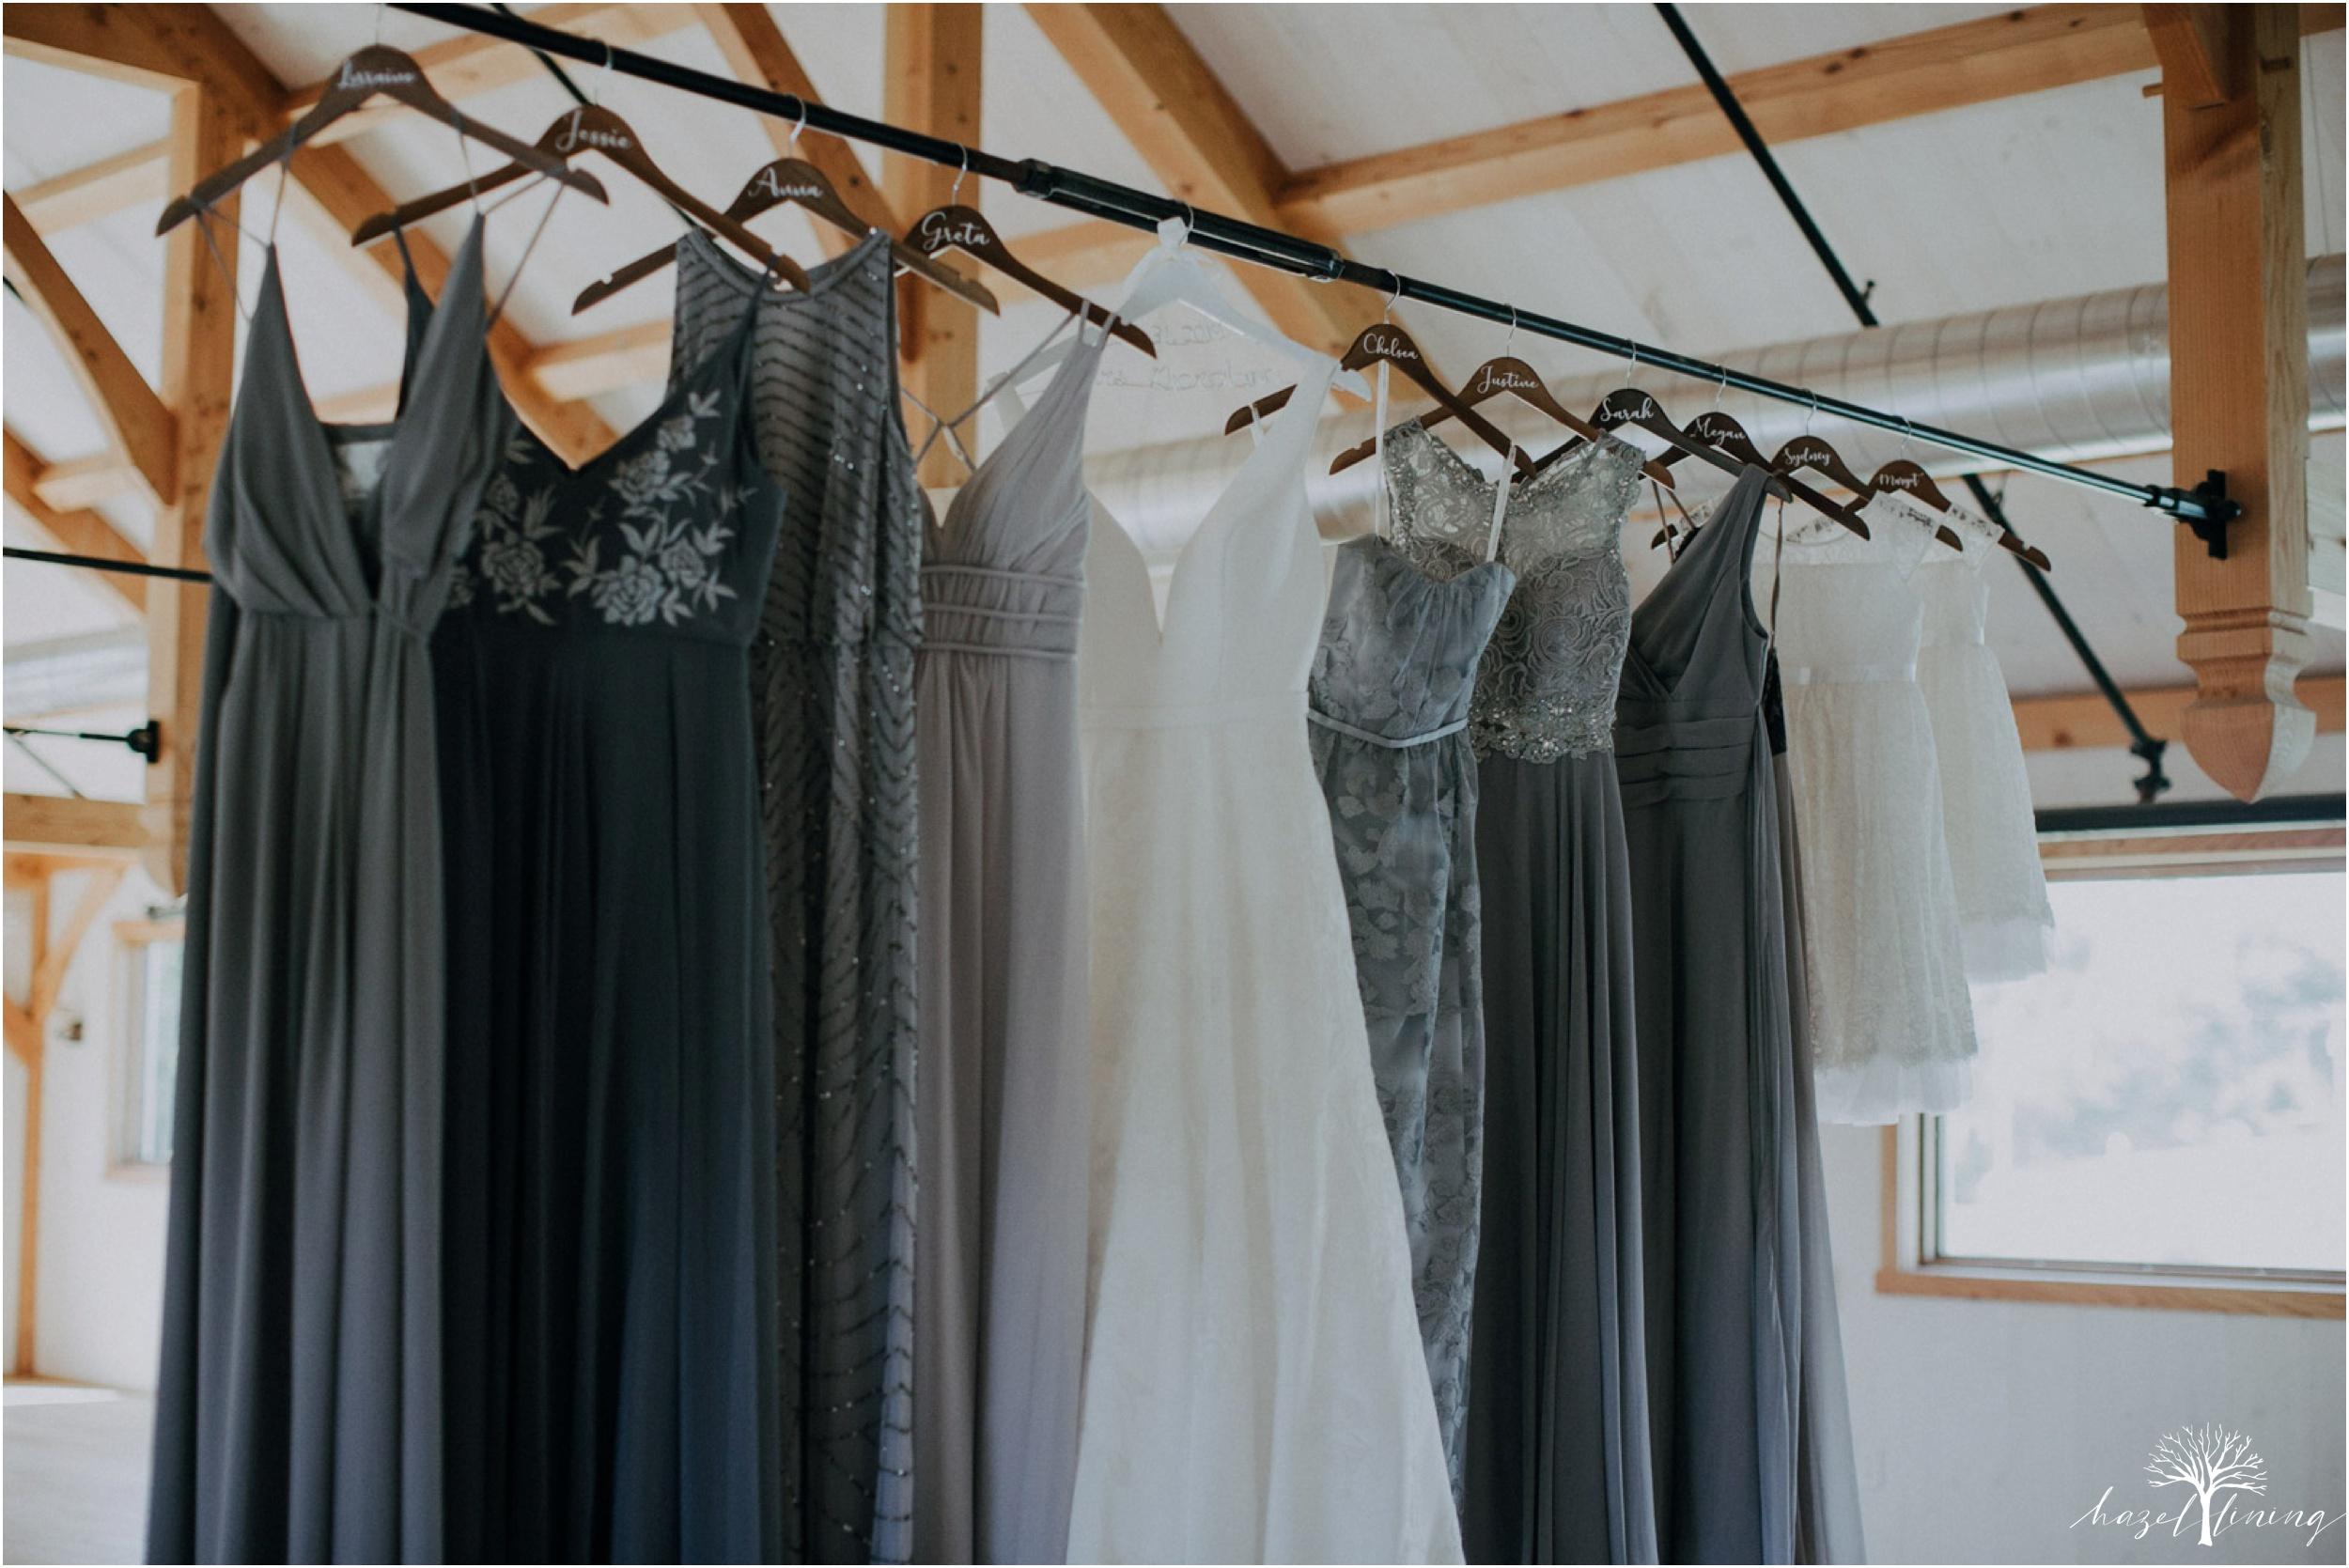 maureen-hepner-anthony-giordano-rose-bank-winery-newtow-pennsylvania-luxury-summer-wedding-hazel-lining-photography-destination-elopement-wedding-engagement-photography_0013.jpg